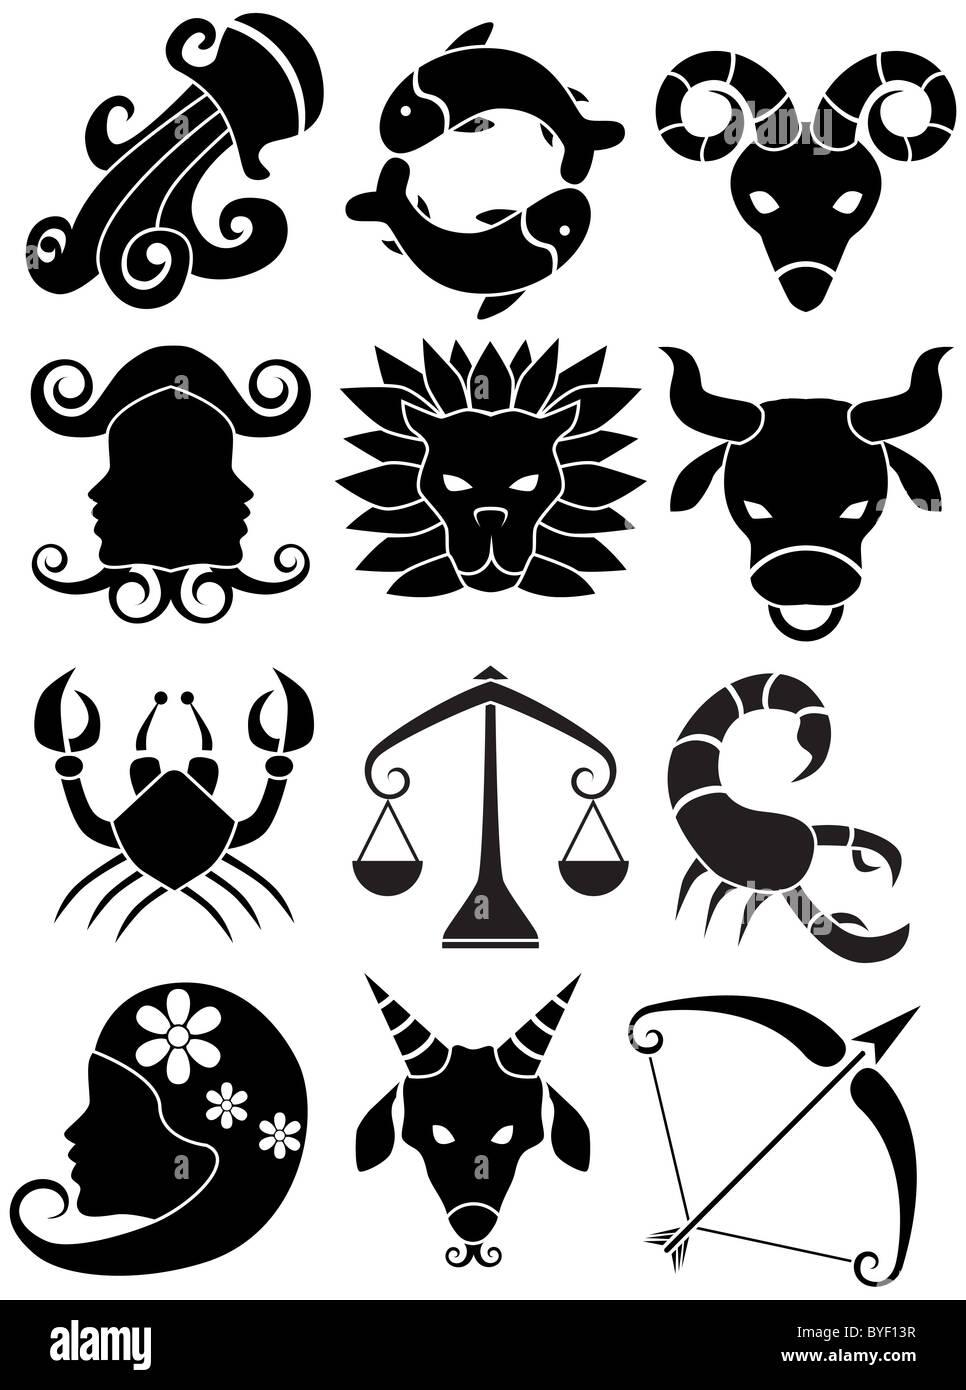 An image of the 12 zodiac symbols. - Stock Image